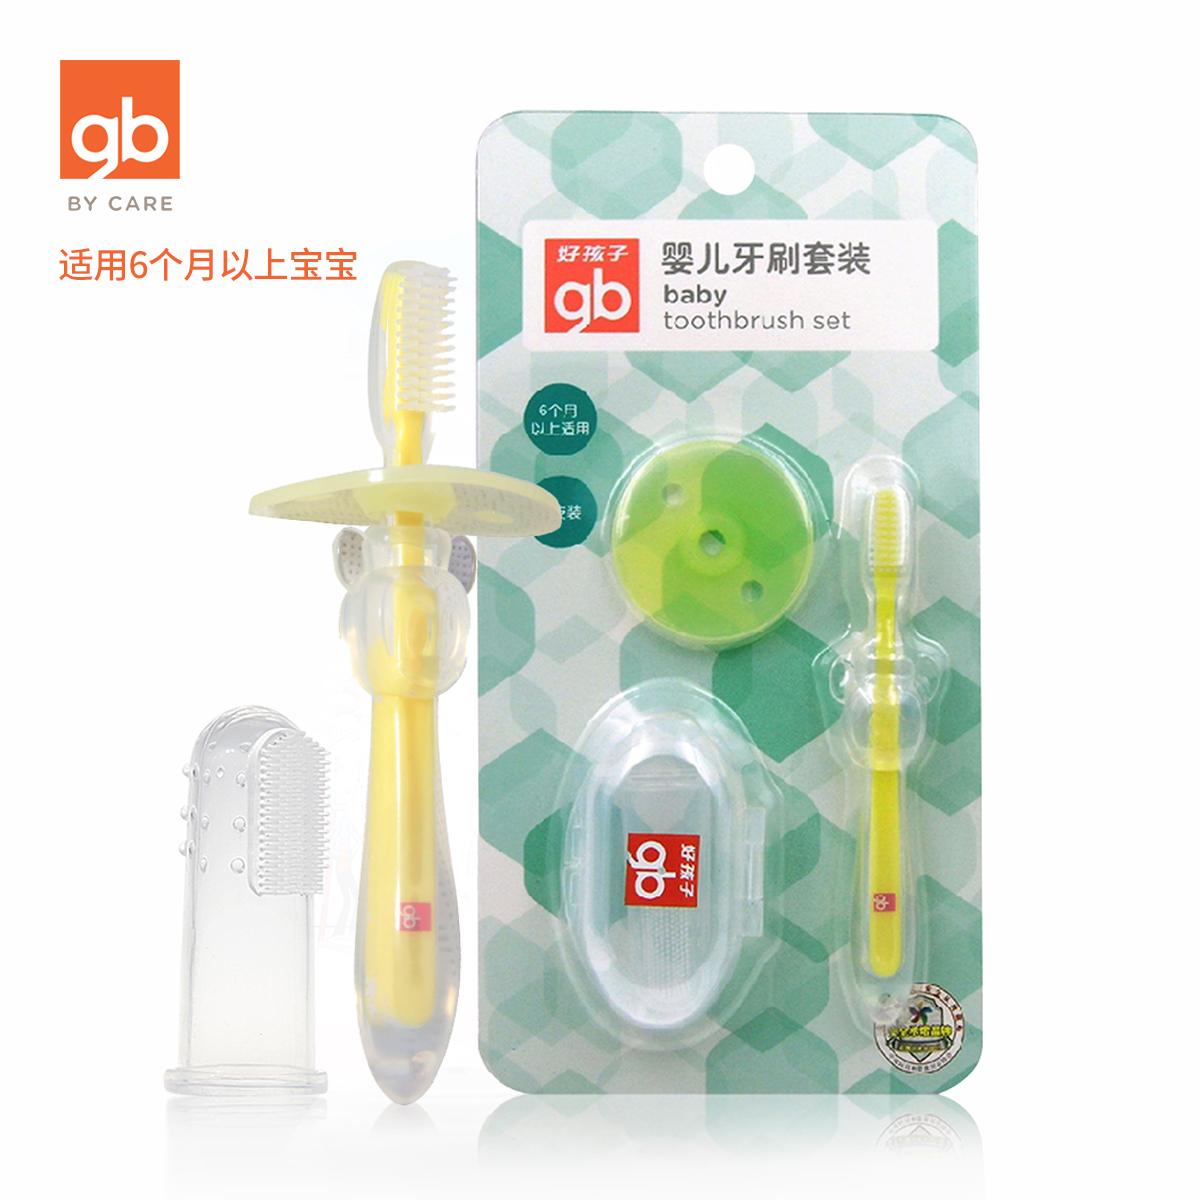 gb好孩子婴儿牙刷套装儿童硅胶软毛训练手指套牙刷6个月-3岁宝宝